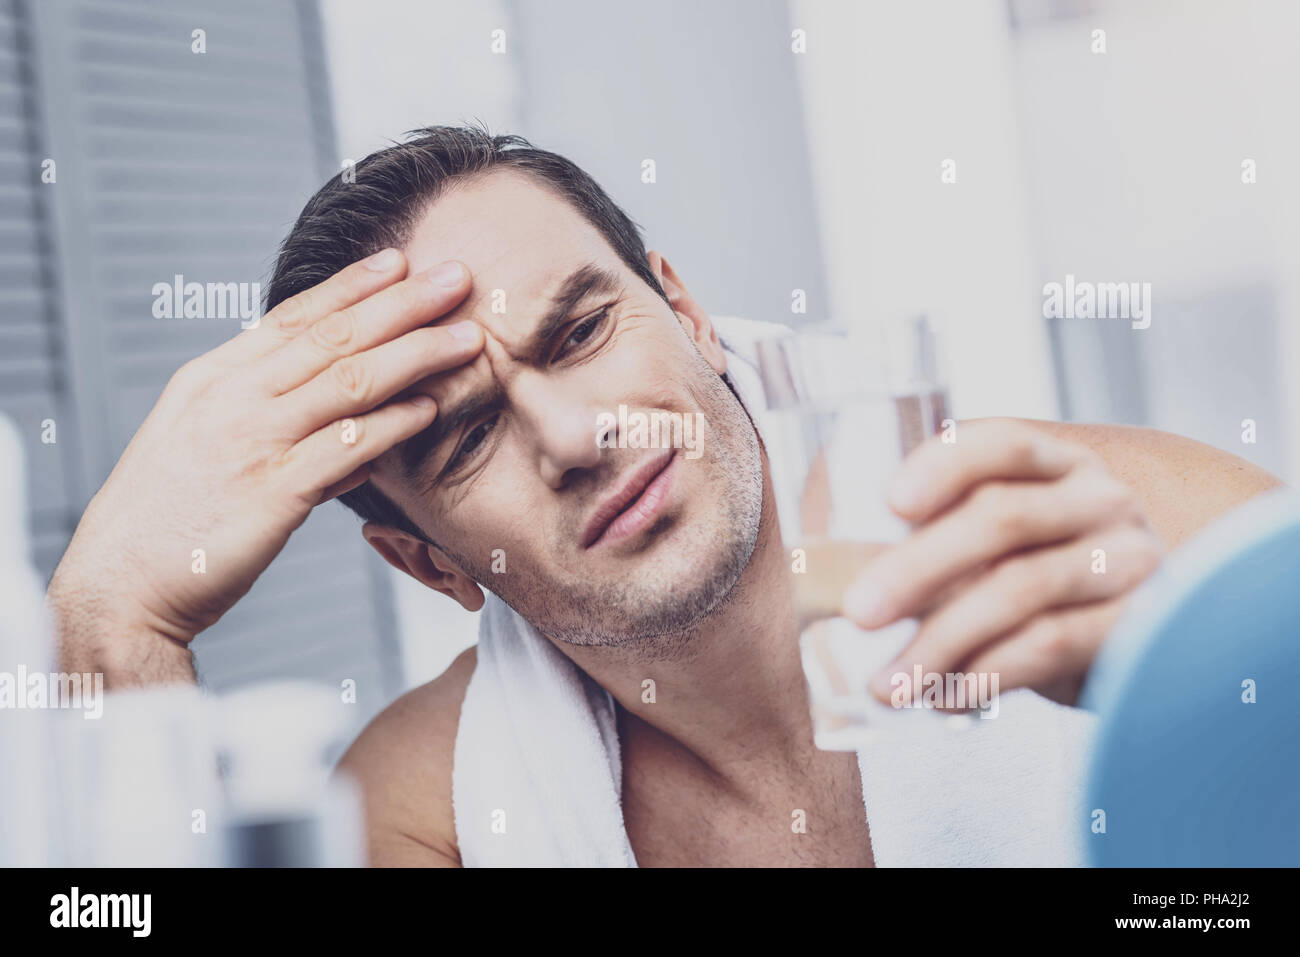 Wearied man having migraine - Stock Image